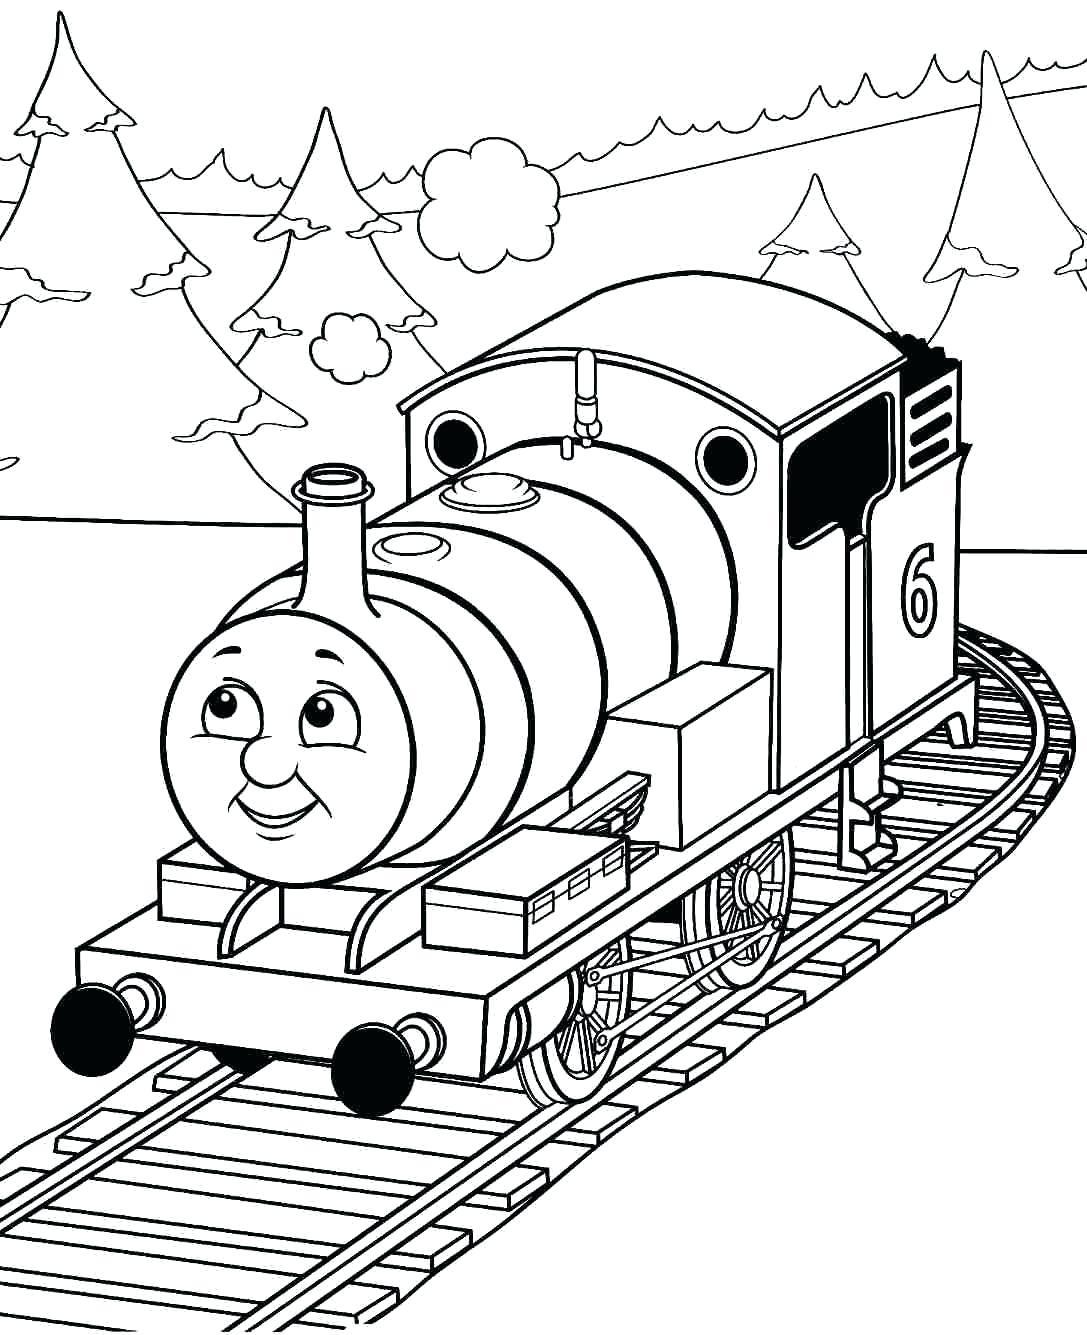 Choo Choo Train Drawing At Getdrawings